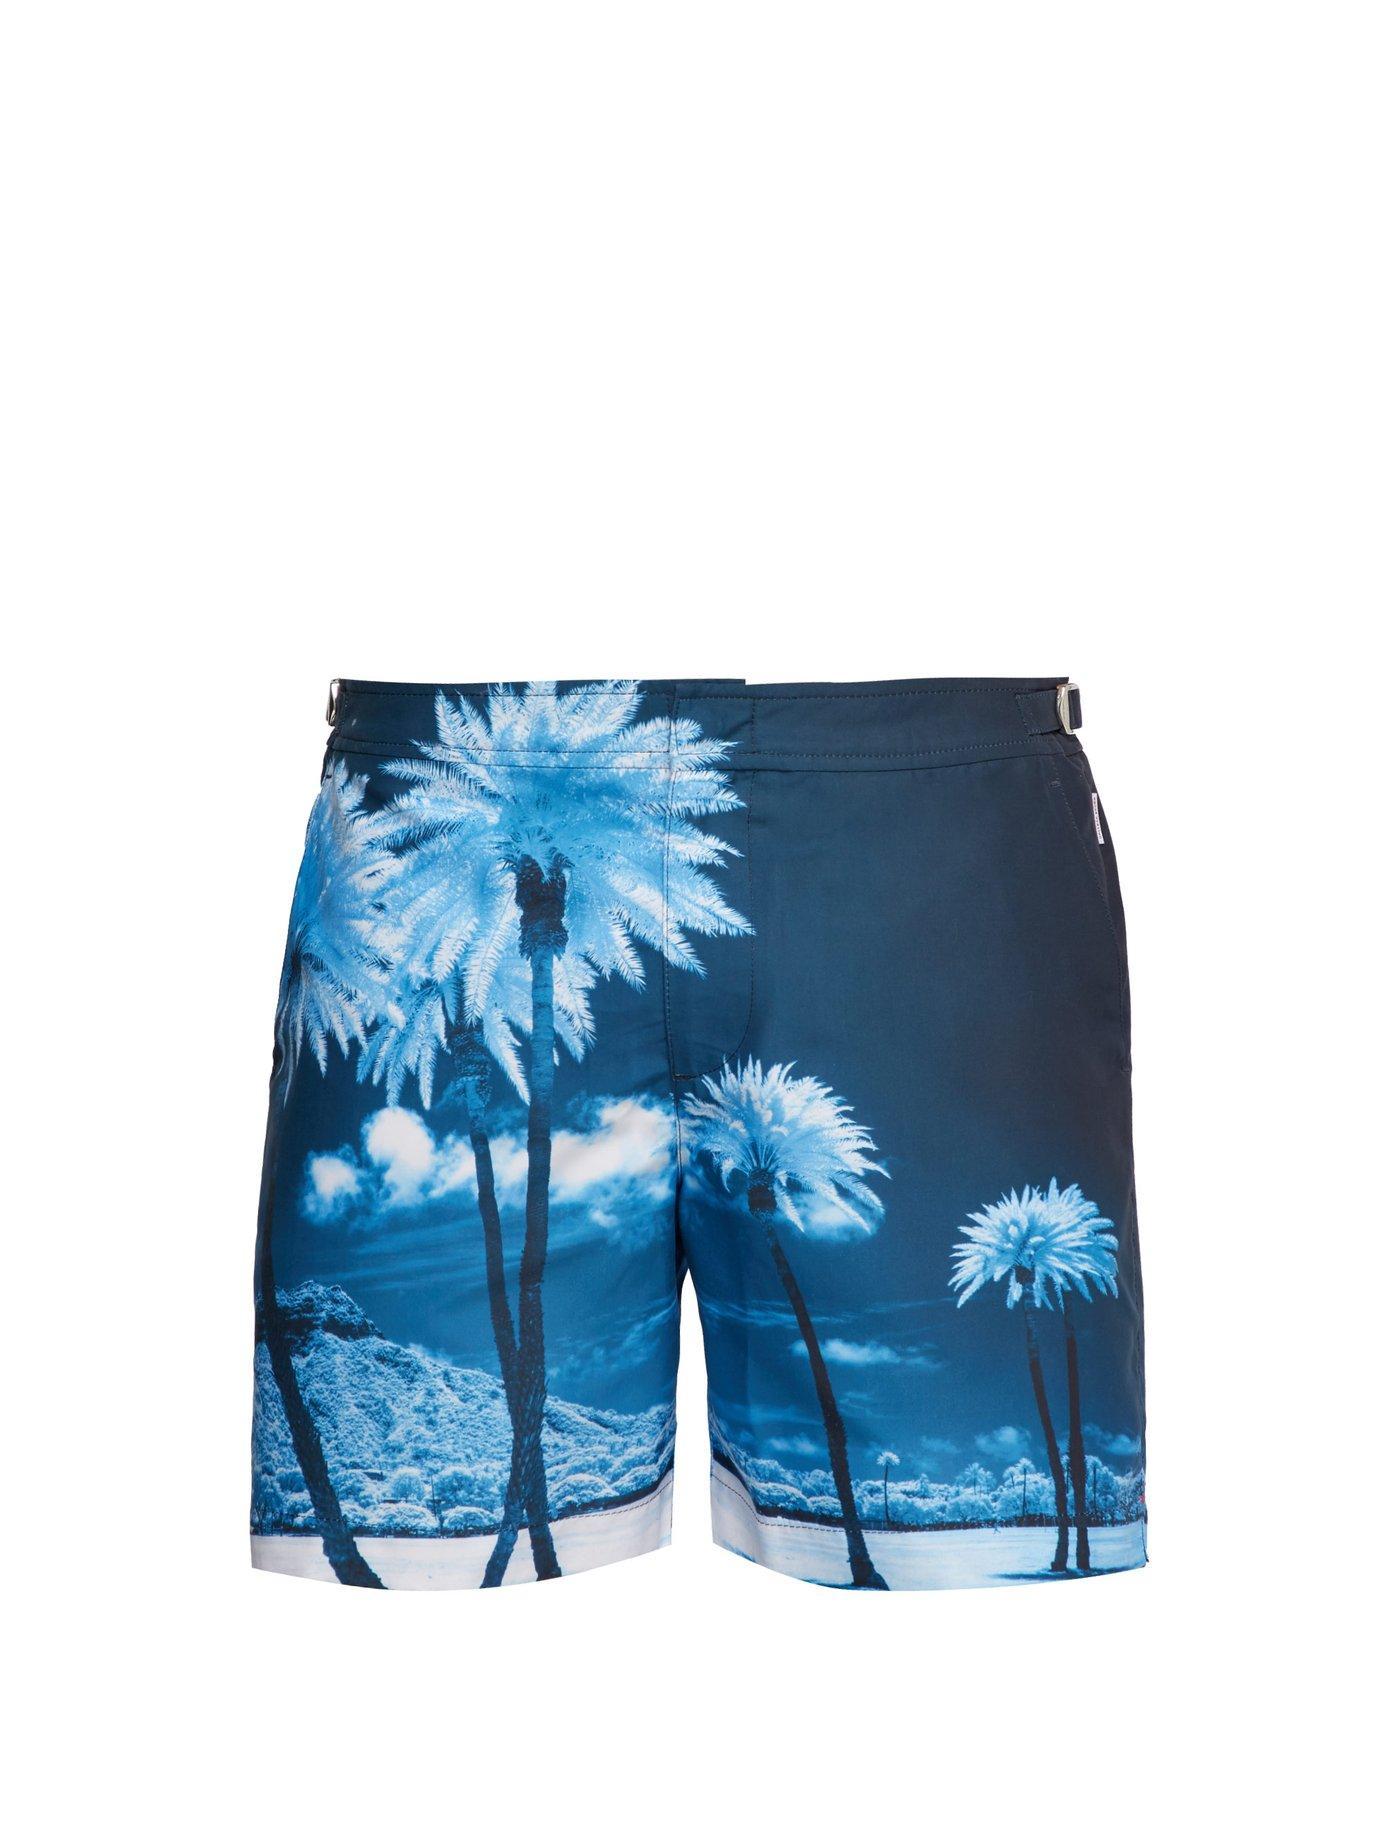 e8c0429339b Lyst - Orlebar Brown Bulldog Palm Tree Print Swim Shorts in Blue for ...